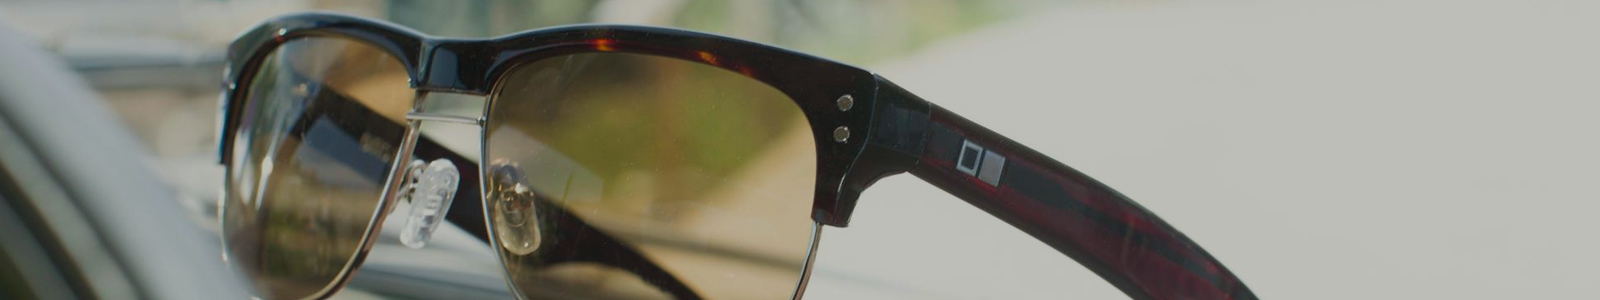 Otis eyewear header.jpg?ixlib=rails 2.1